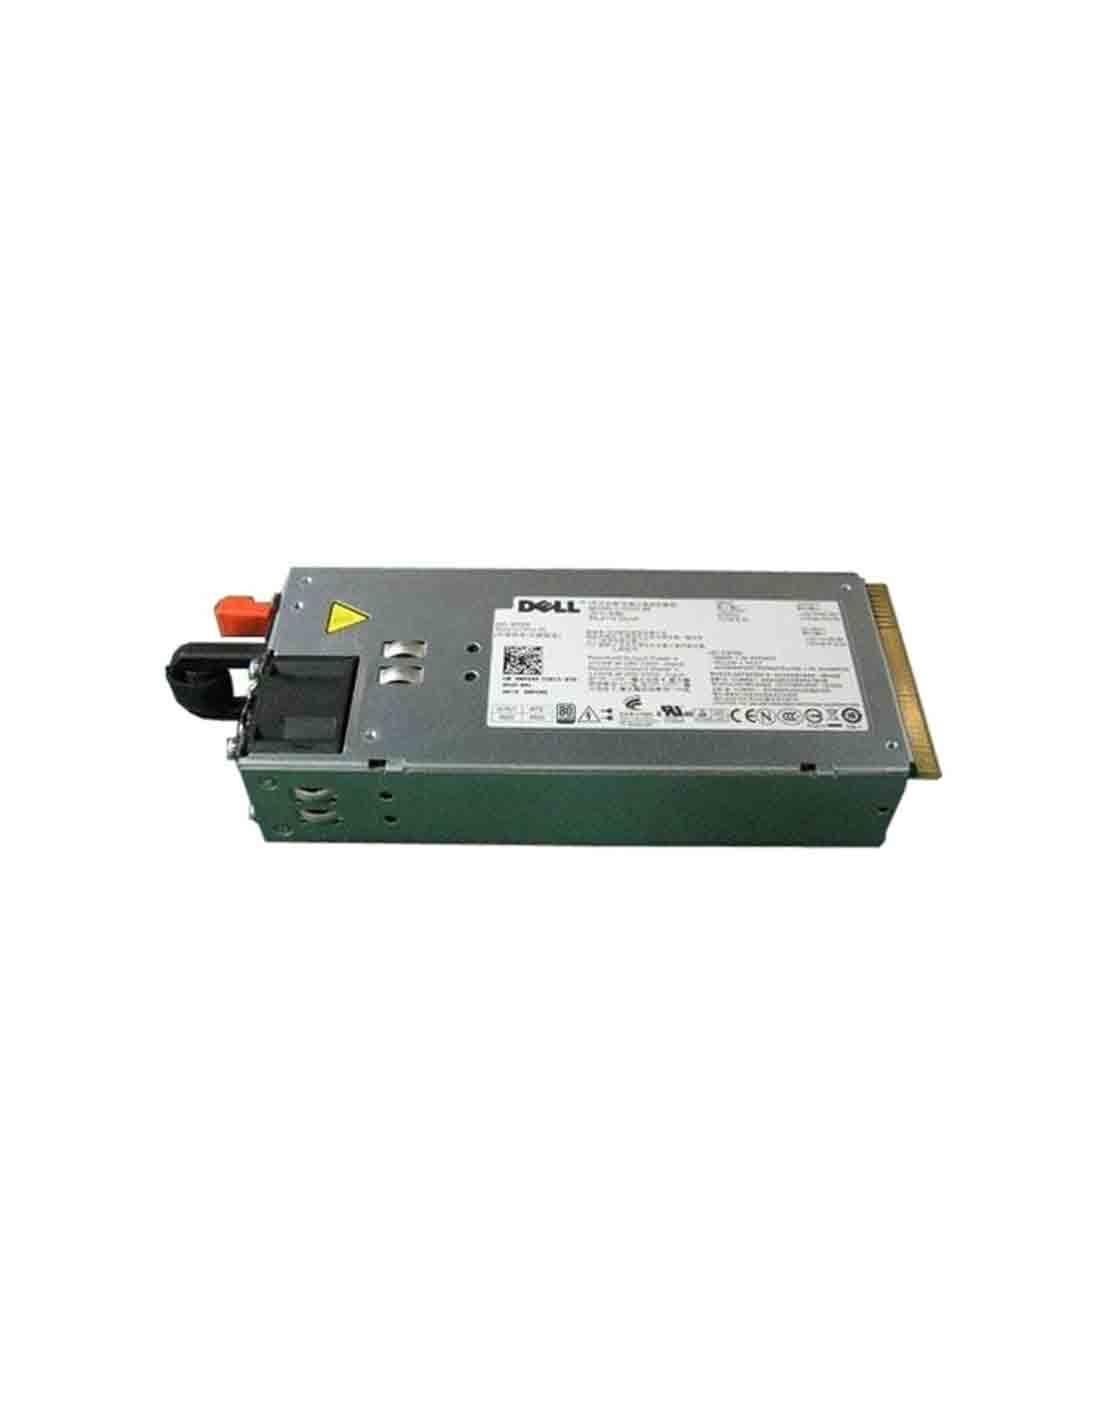 Dell Single, Hot-plug Power Supply (1+0), 495W